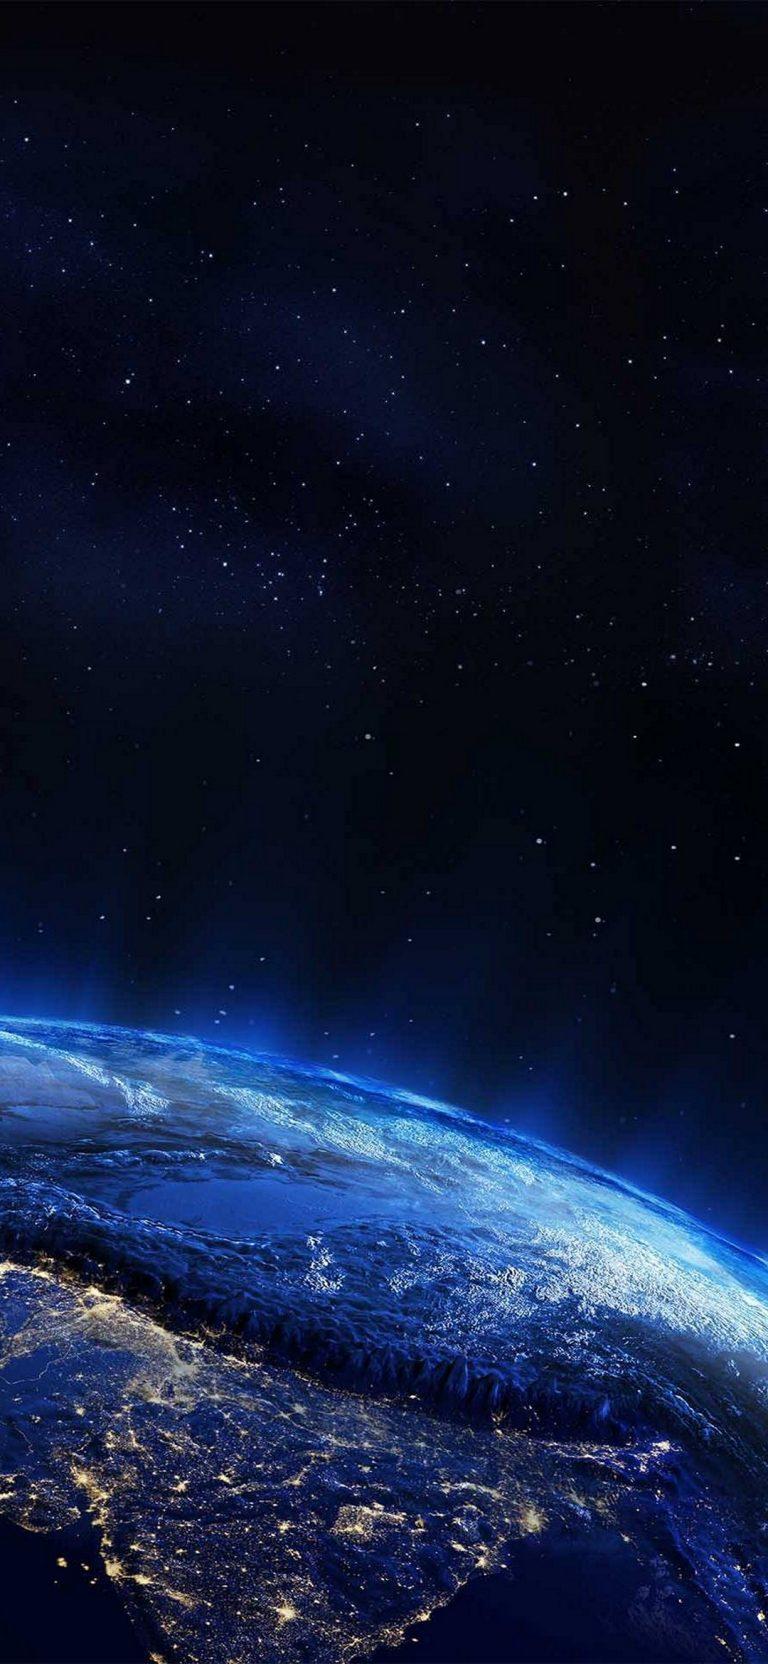 Space Phone Wallpaper 132 1080x2340 768x1664